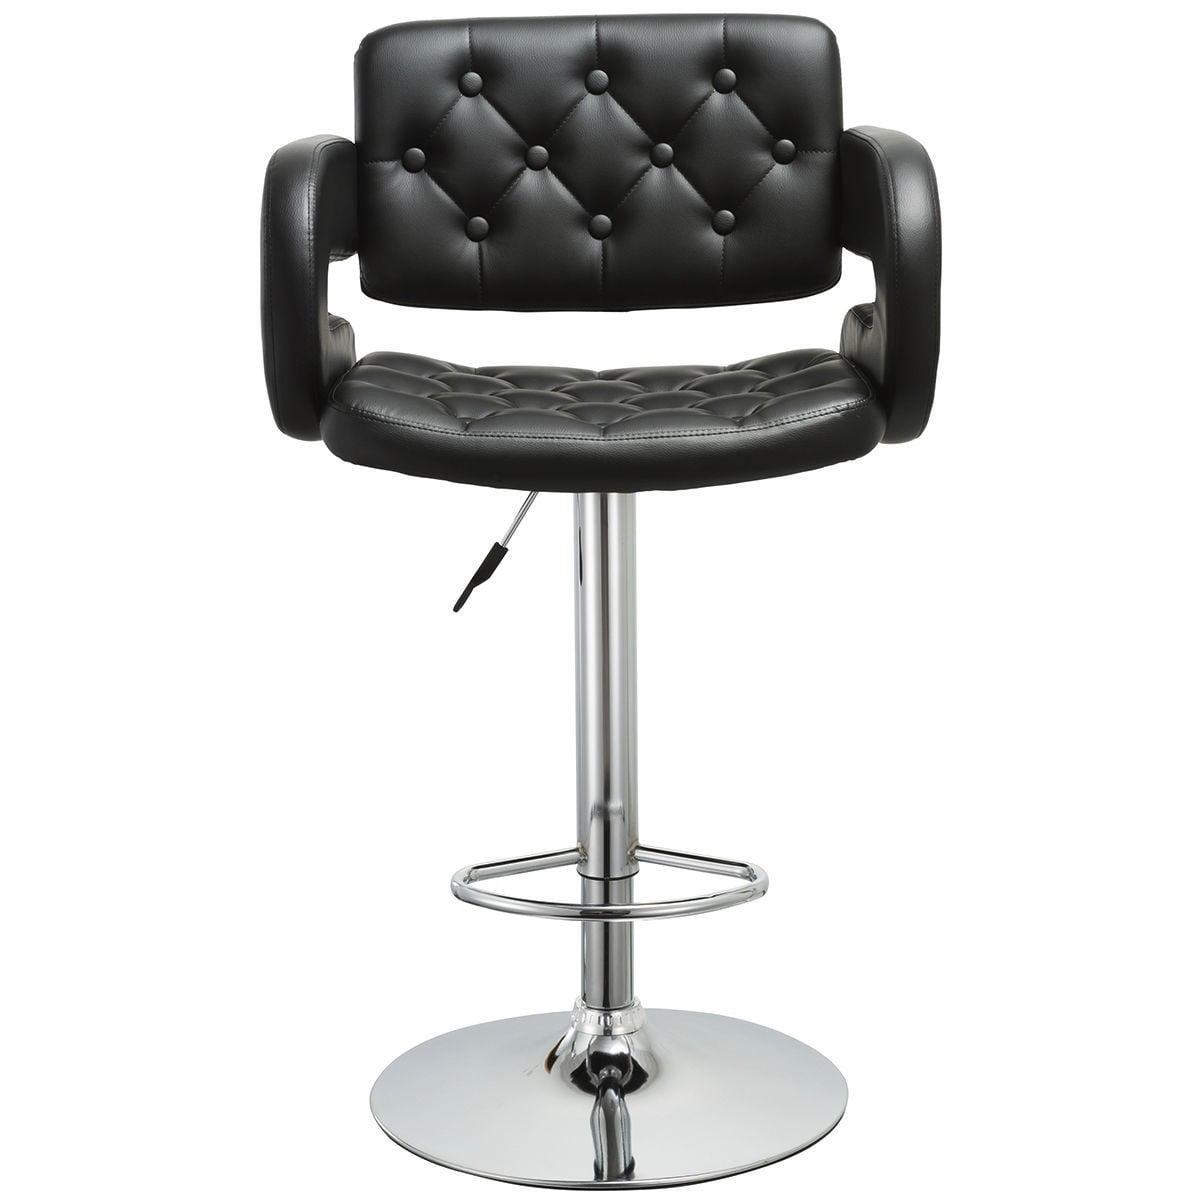 2 pcs PU Leather Adjustable Pub Chair Bar Stool Black by